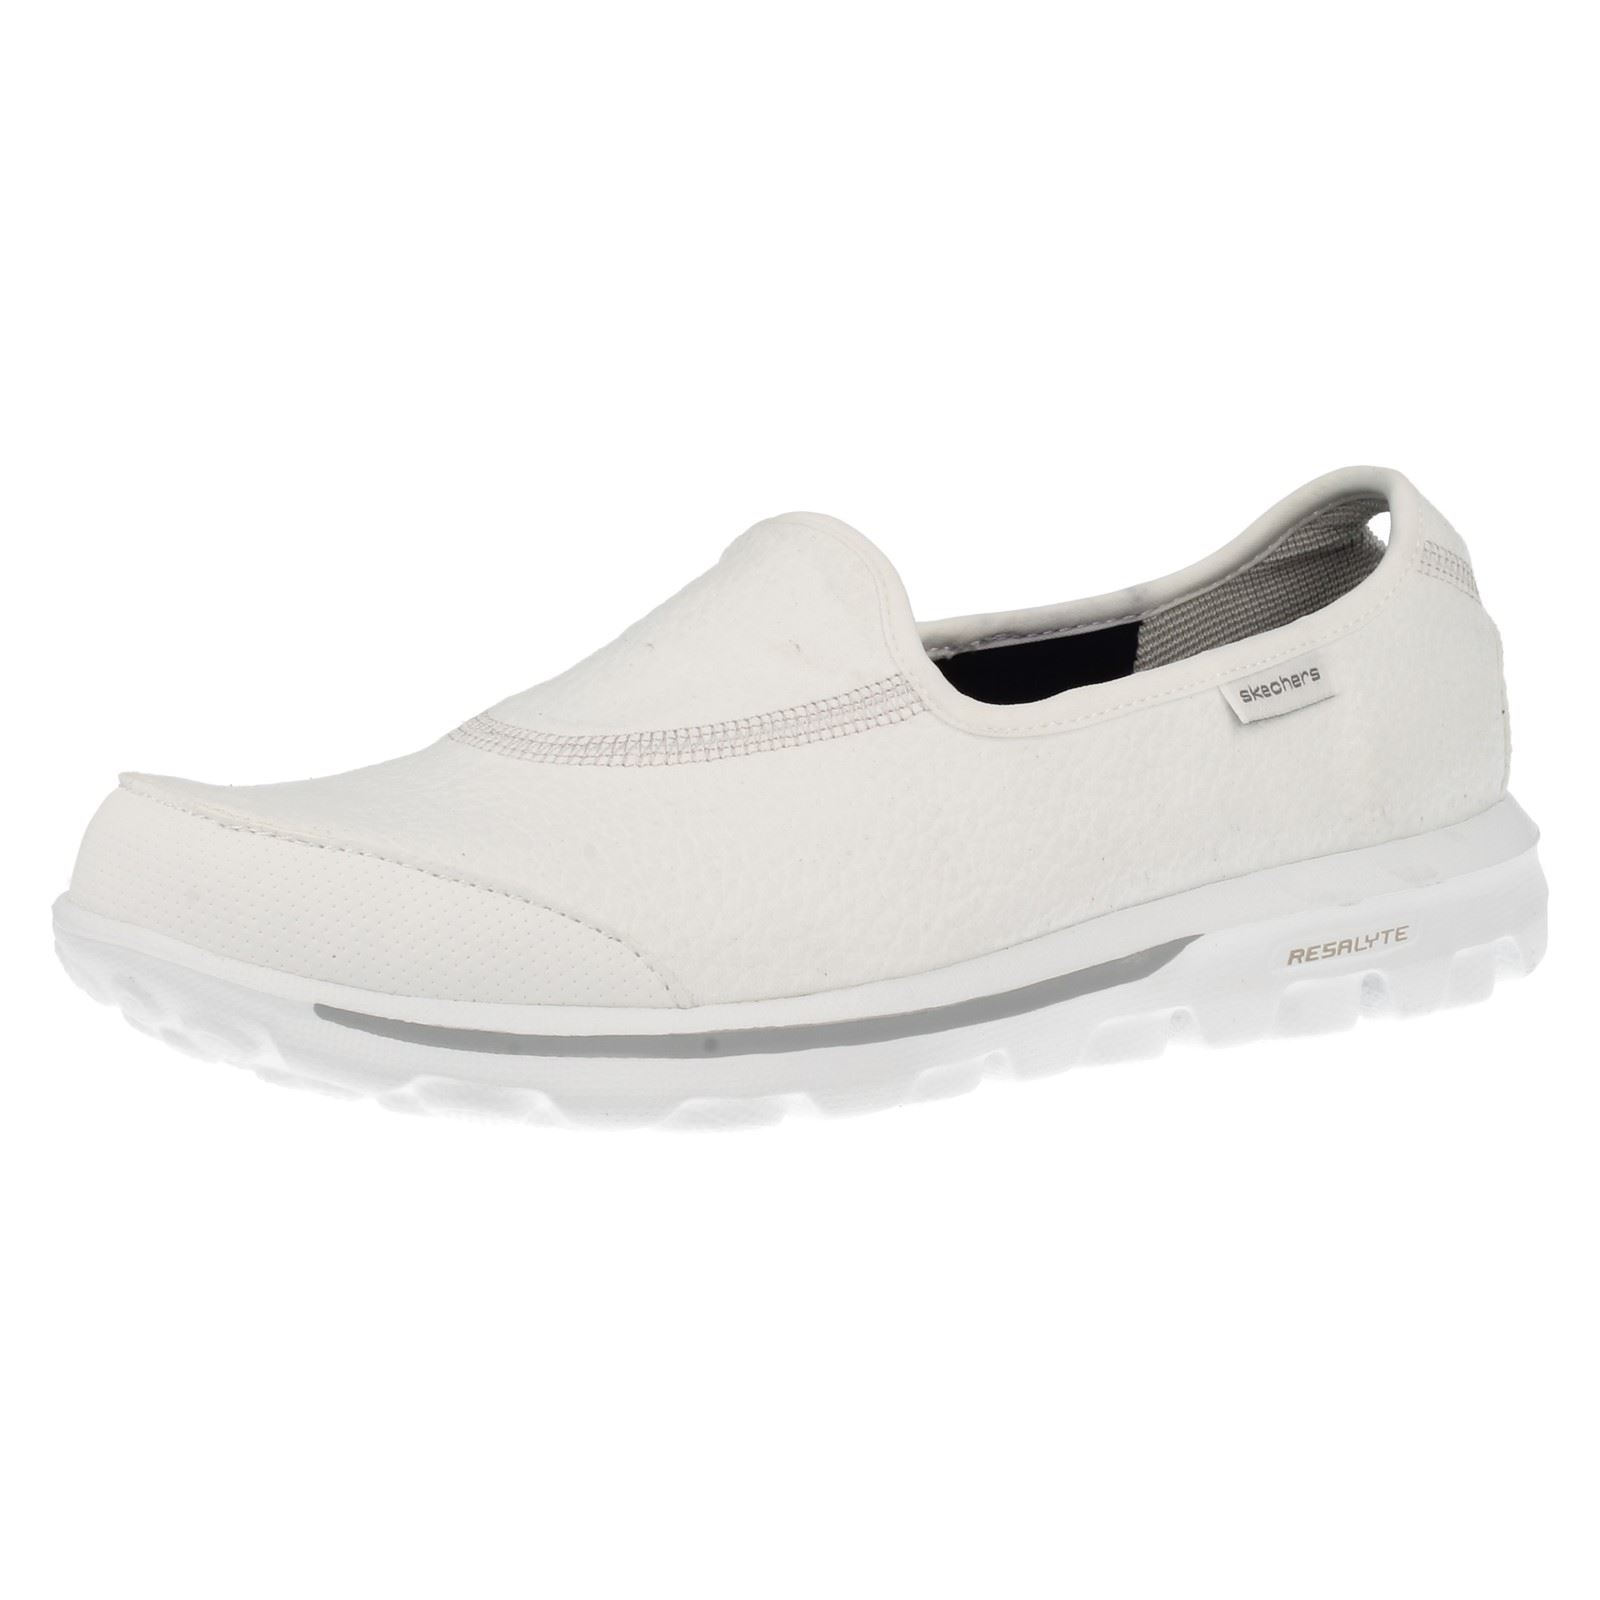 buy skechers slip on walking shoes gt off49 discounted